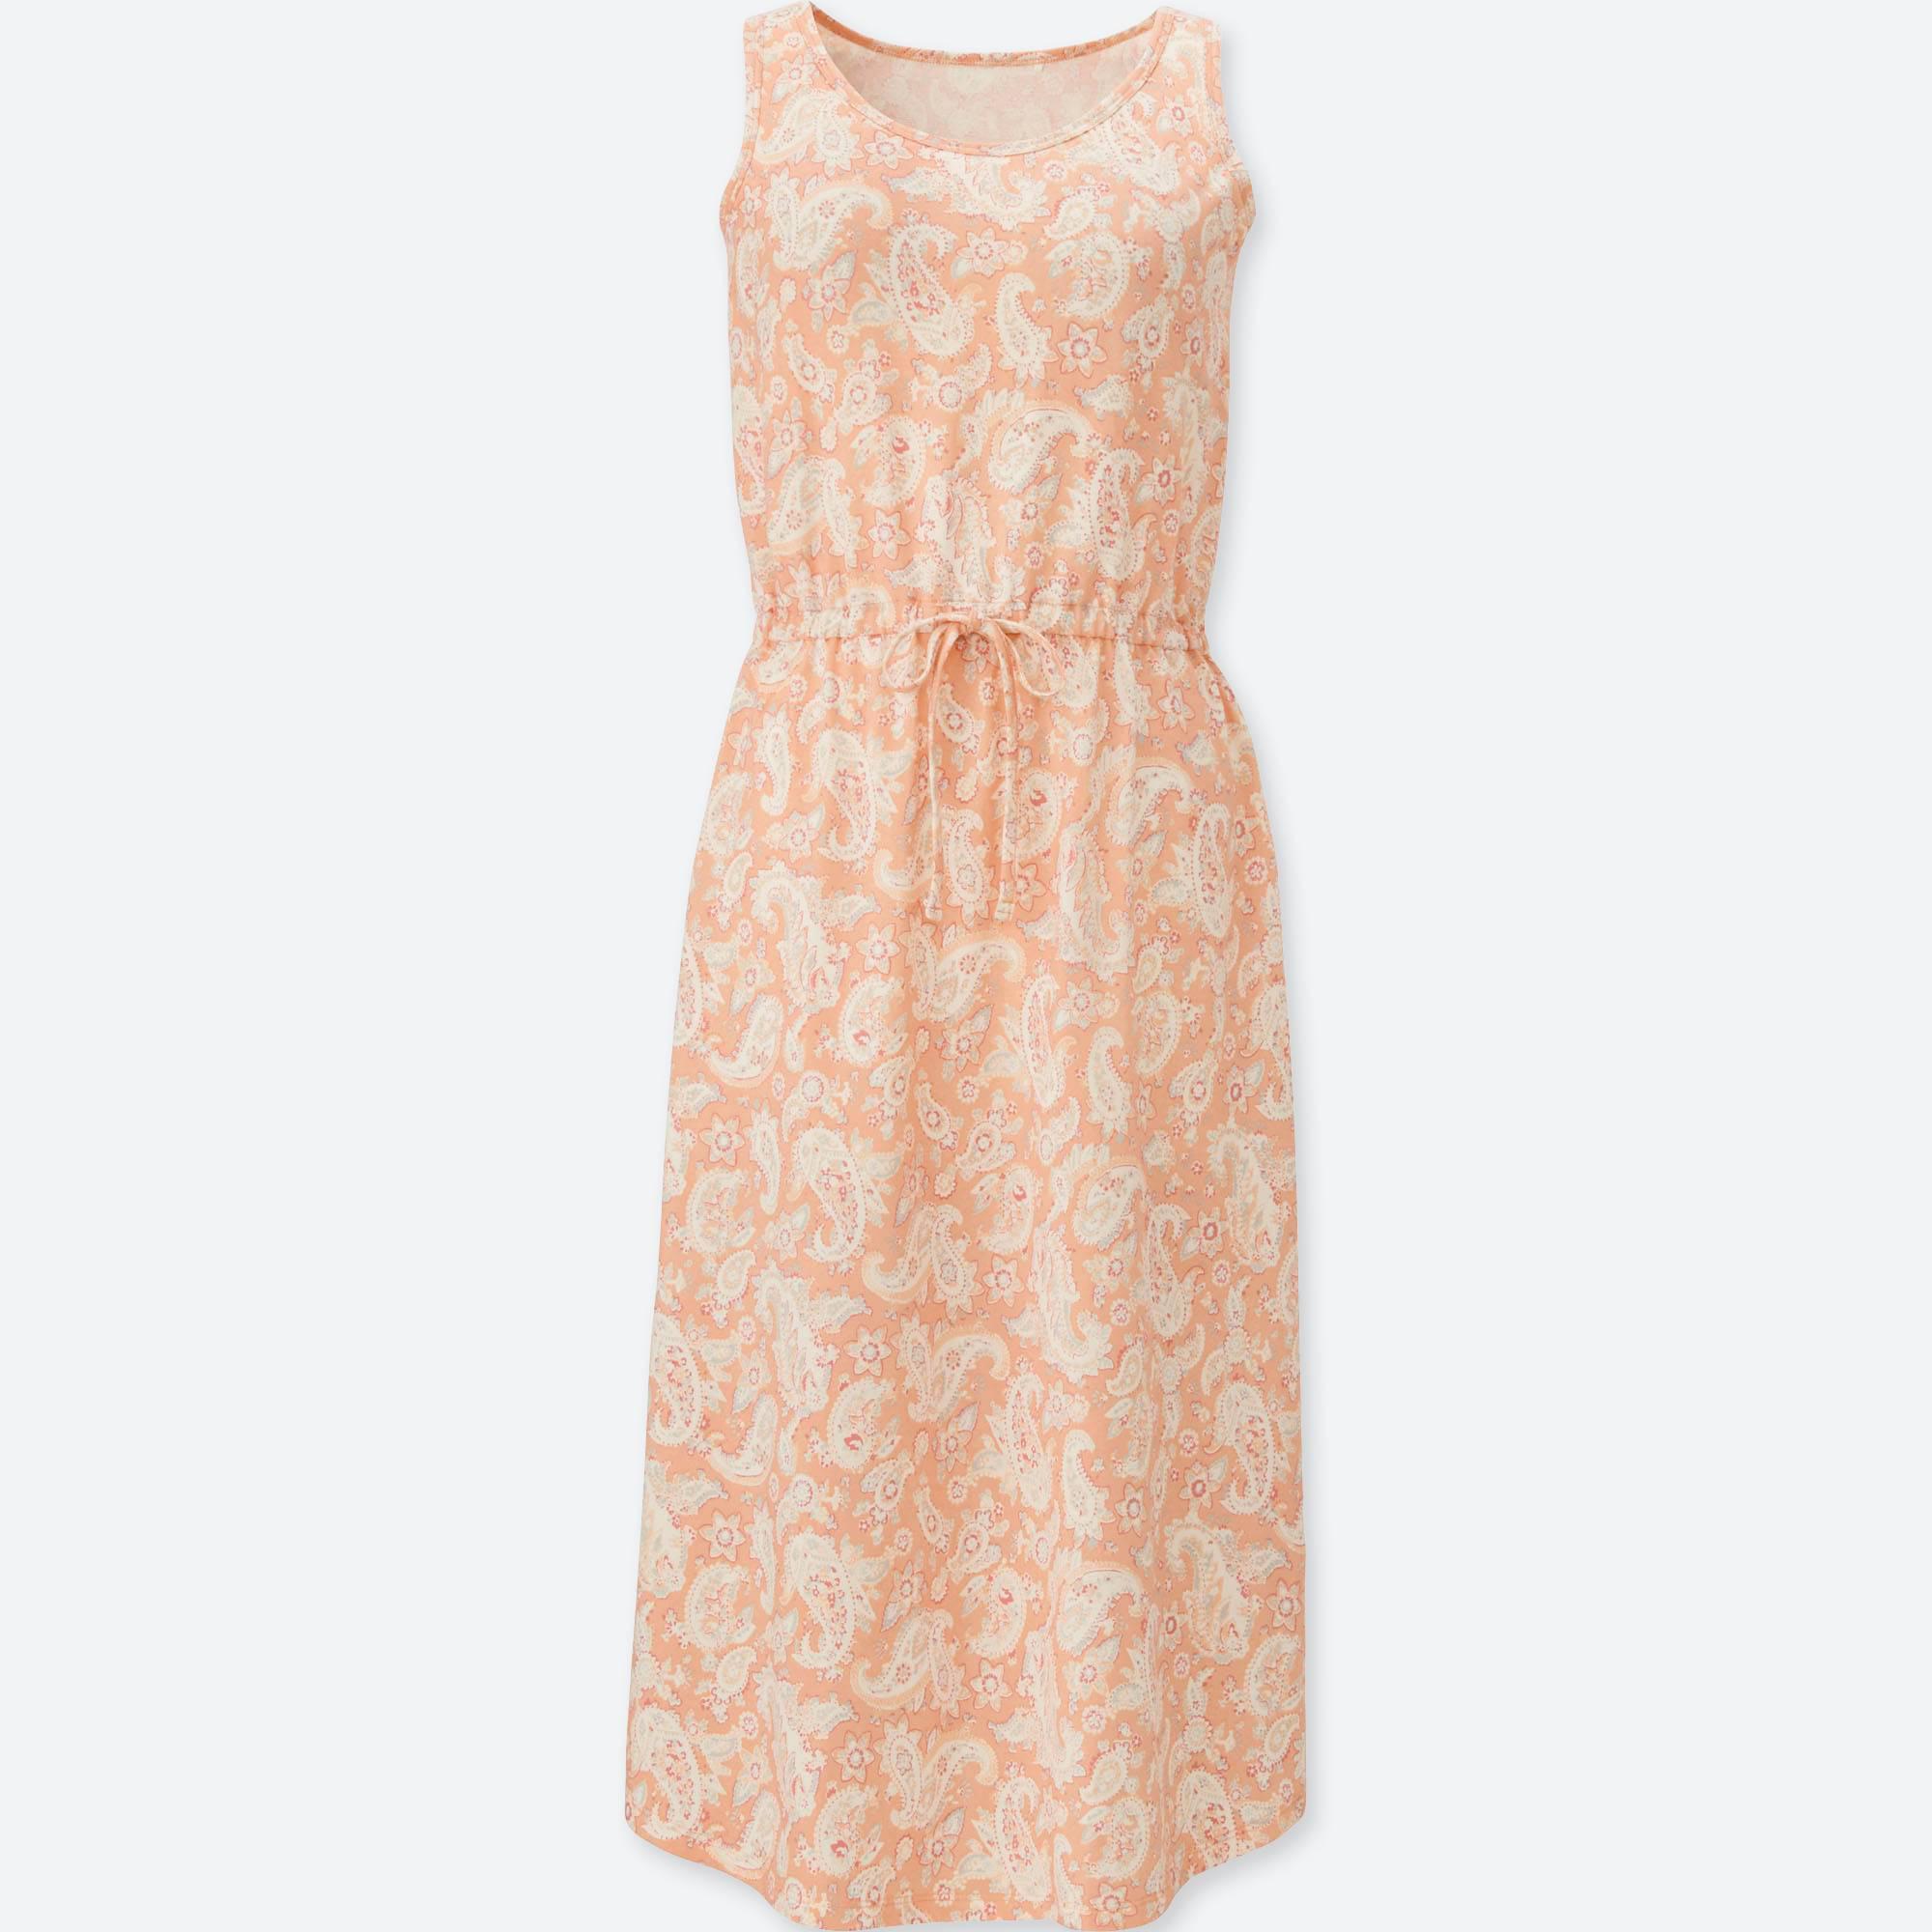 f1b378b420 Lyst - Uniqlo Sleeveless Relax Bra Dress in Orange